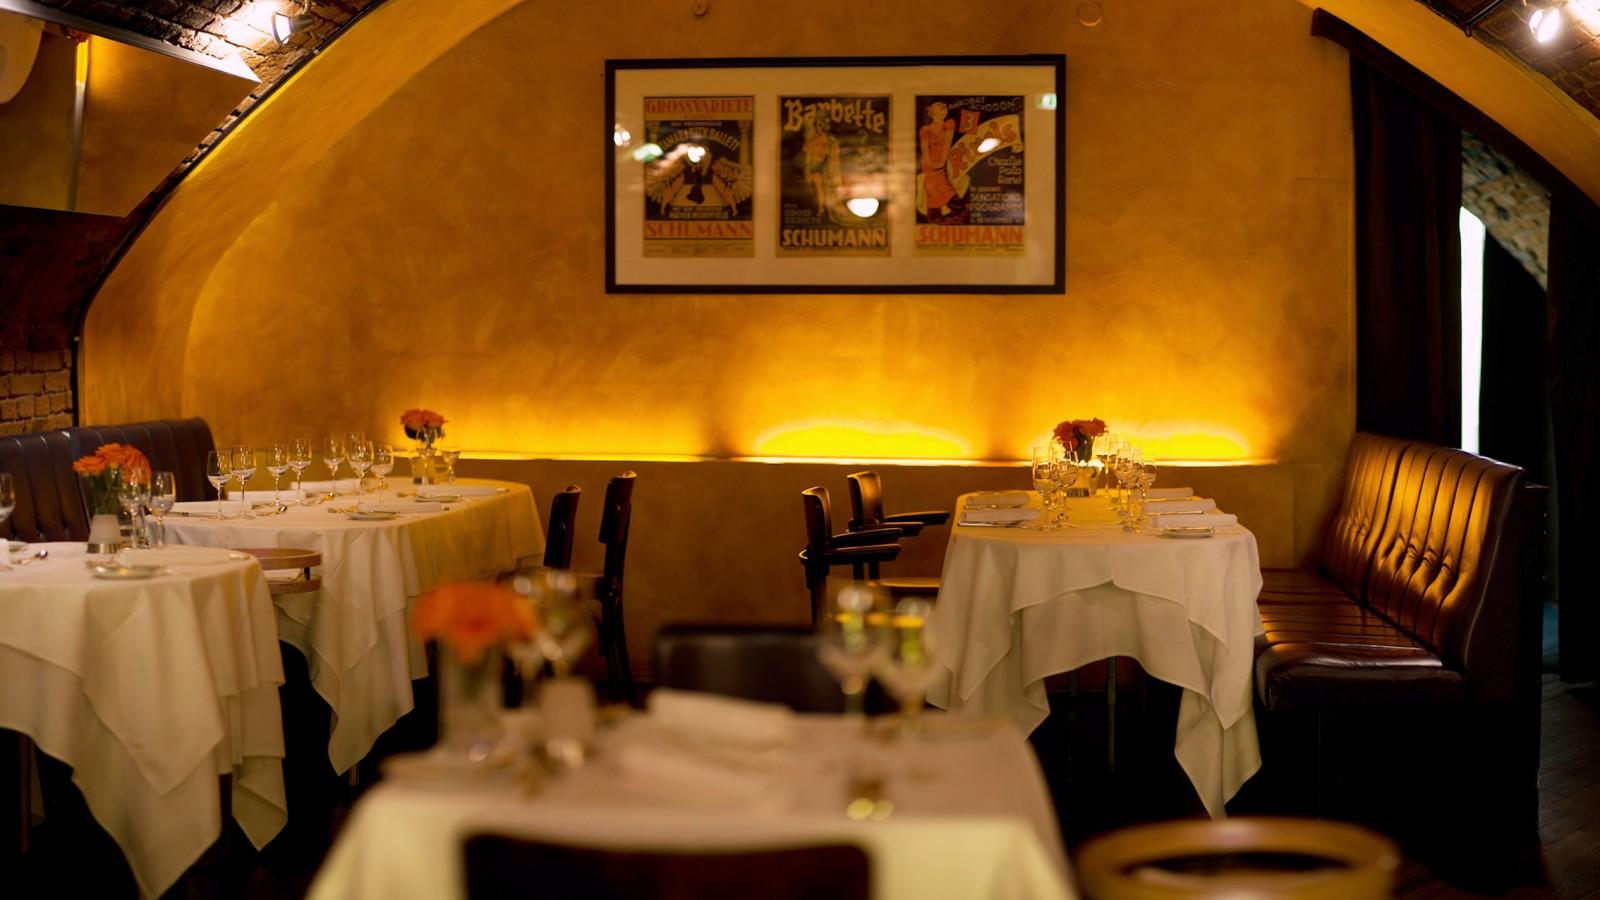 palastbar restaurant in frankfurt am main. Black Bedroom Furniture Sets. Home Design Ideas